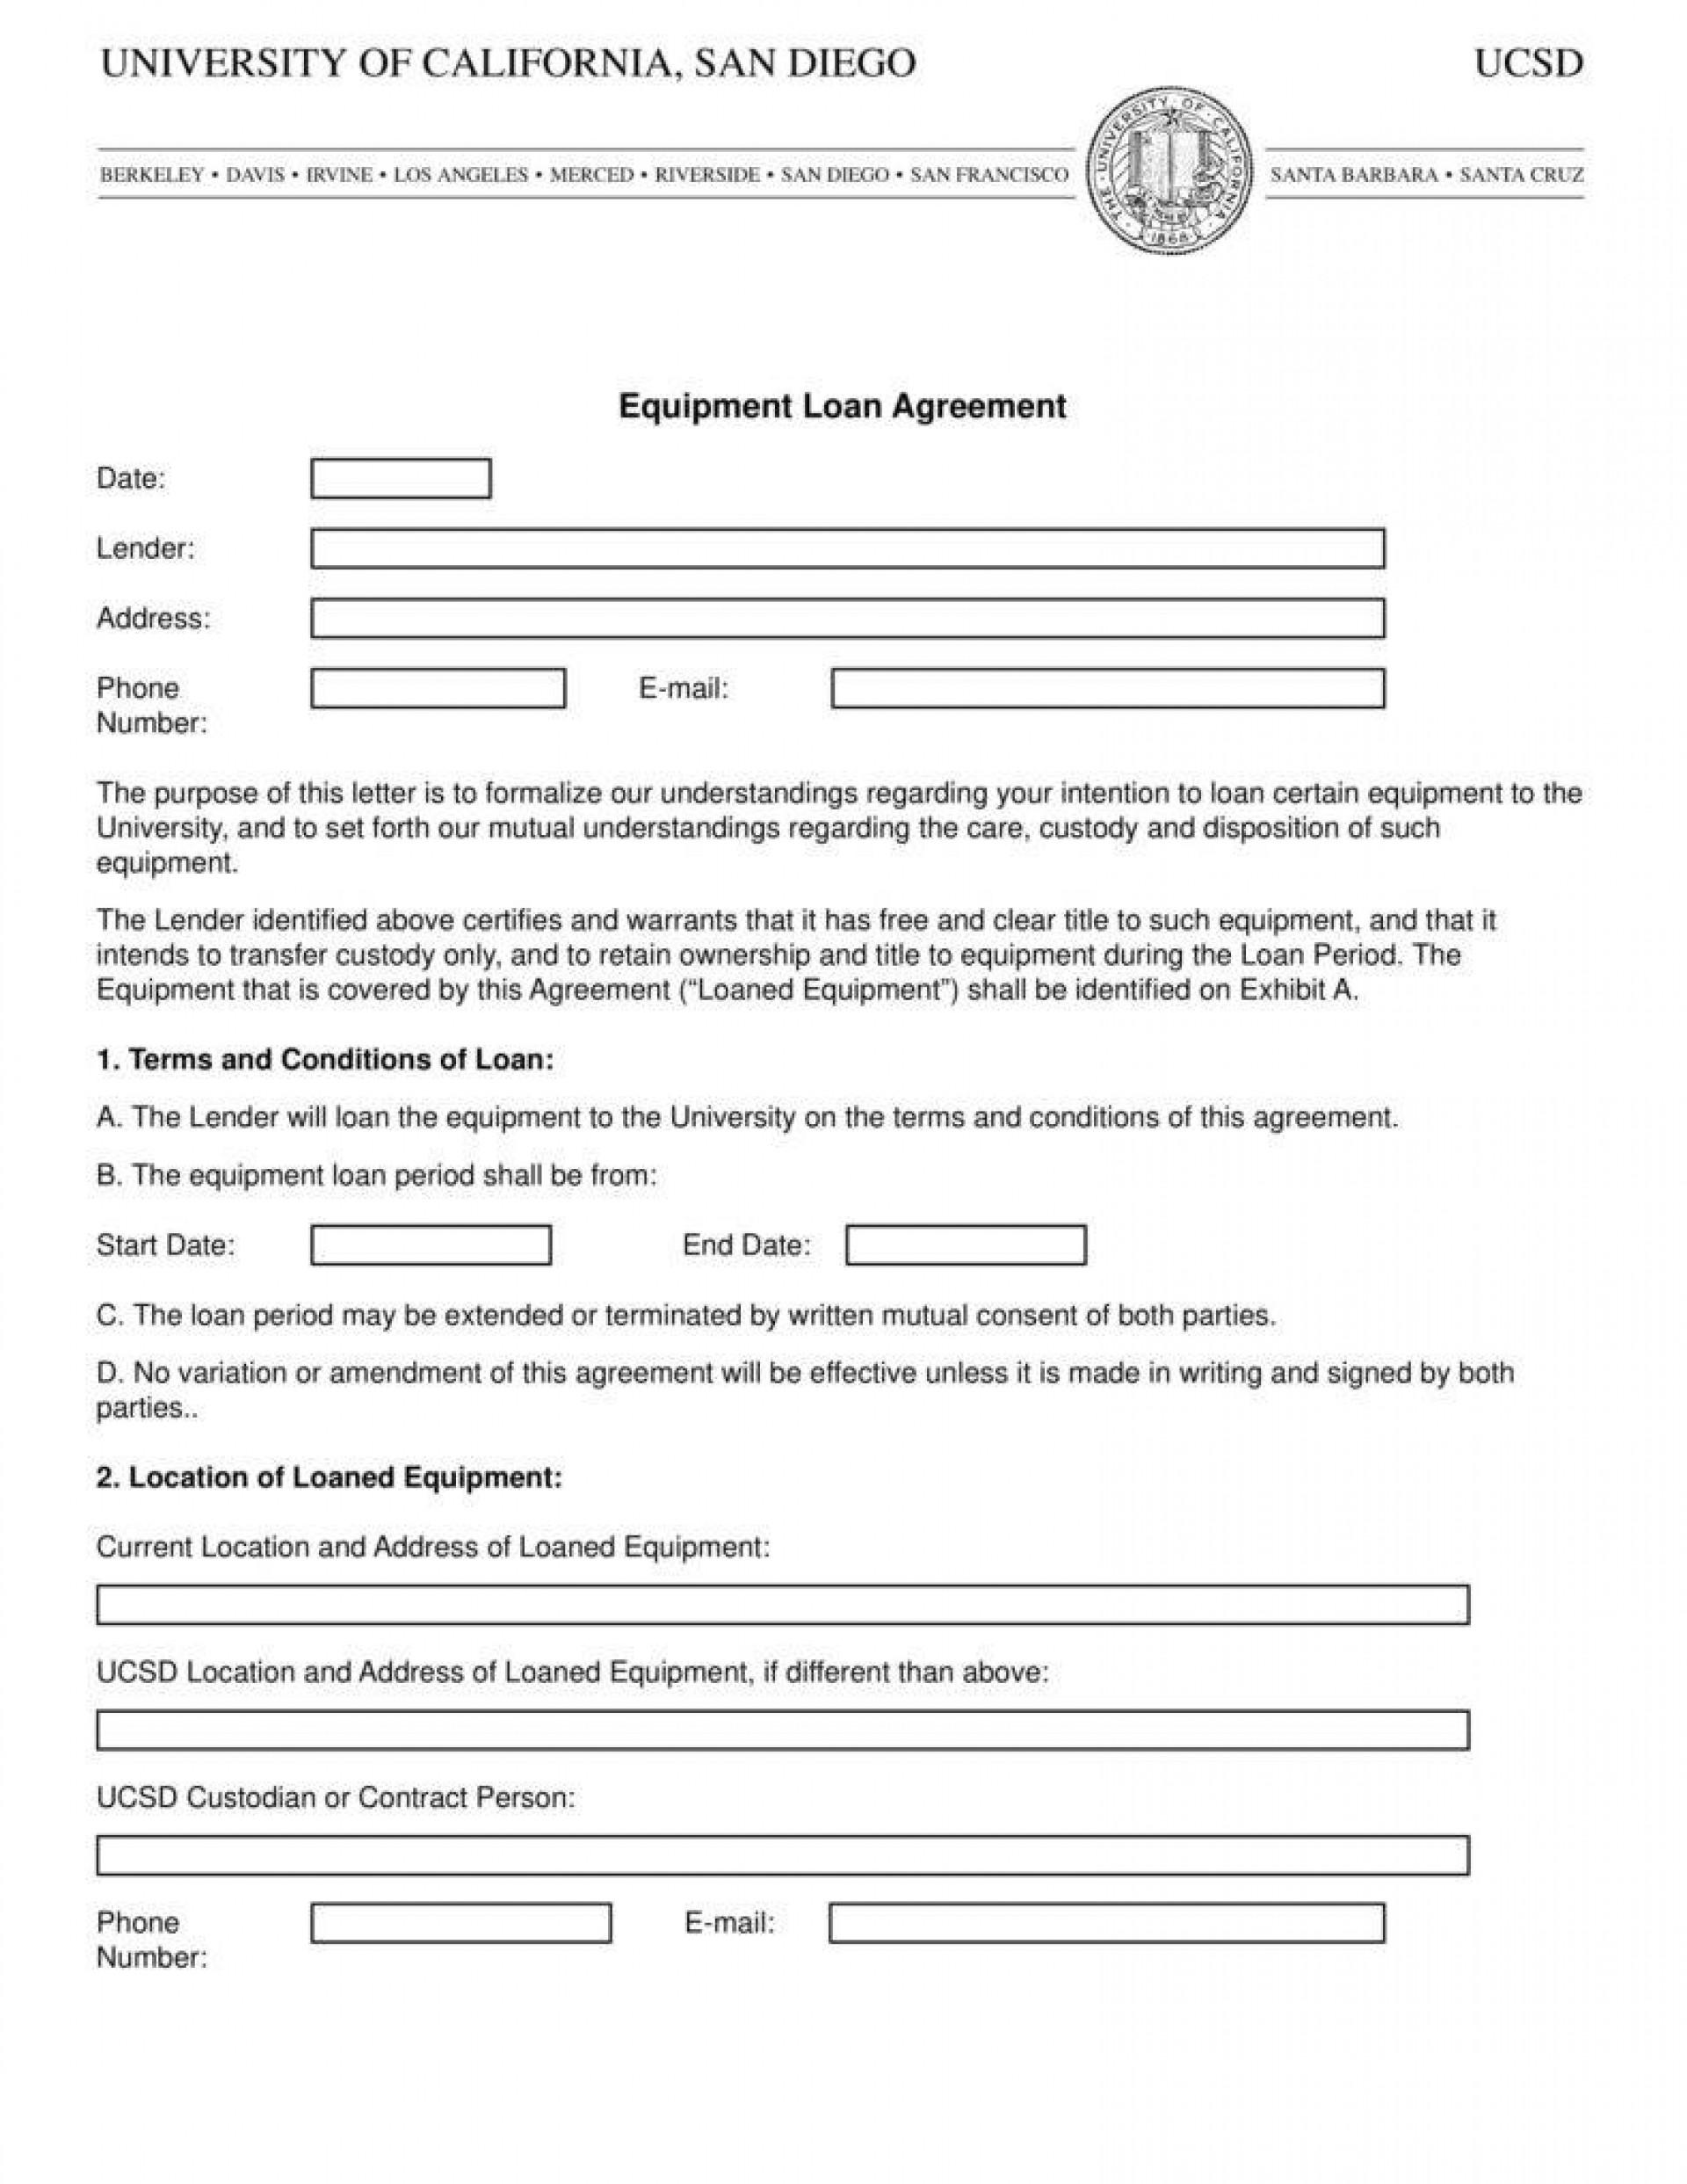 Equipment Loan Agreement Template Uk